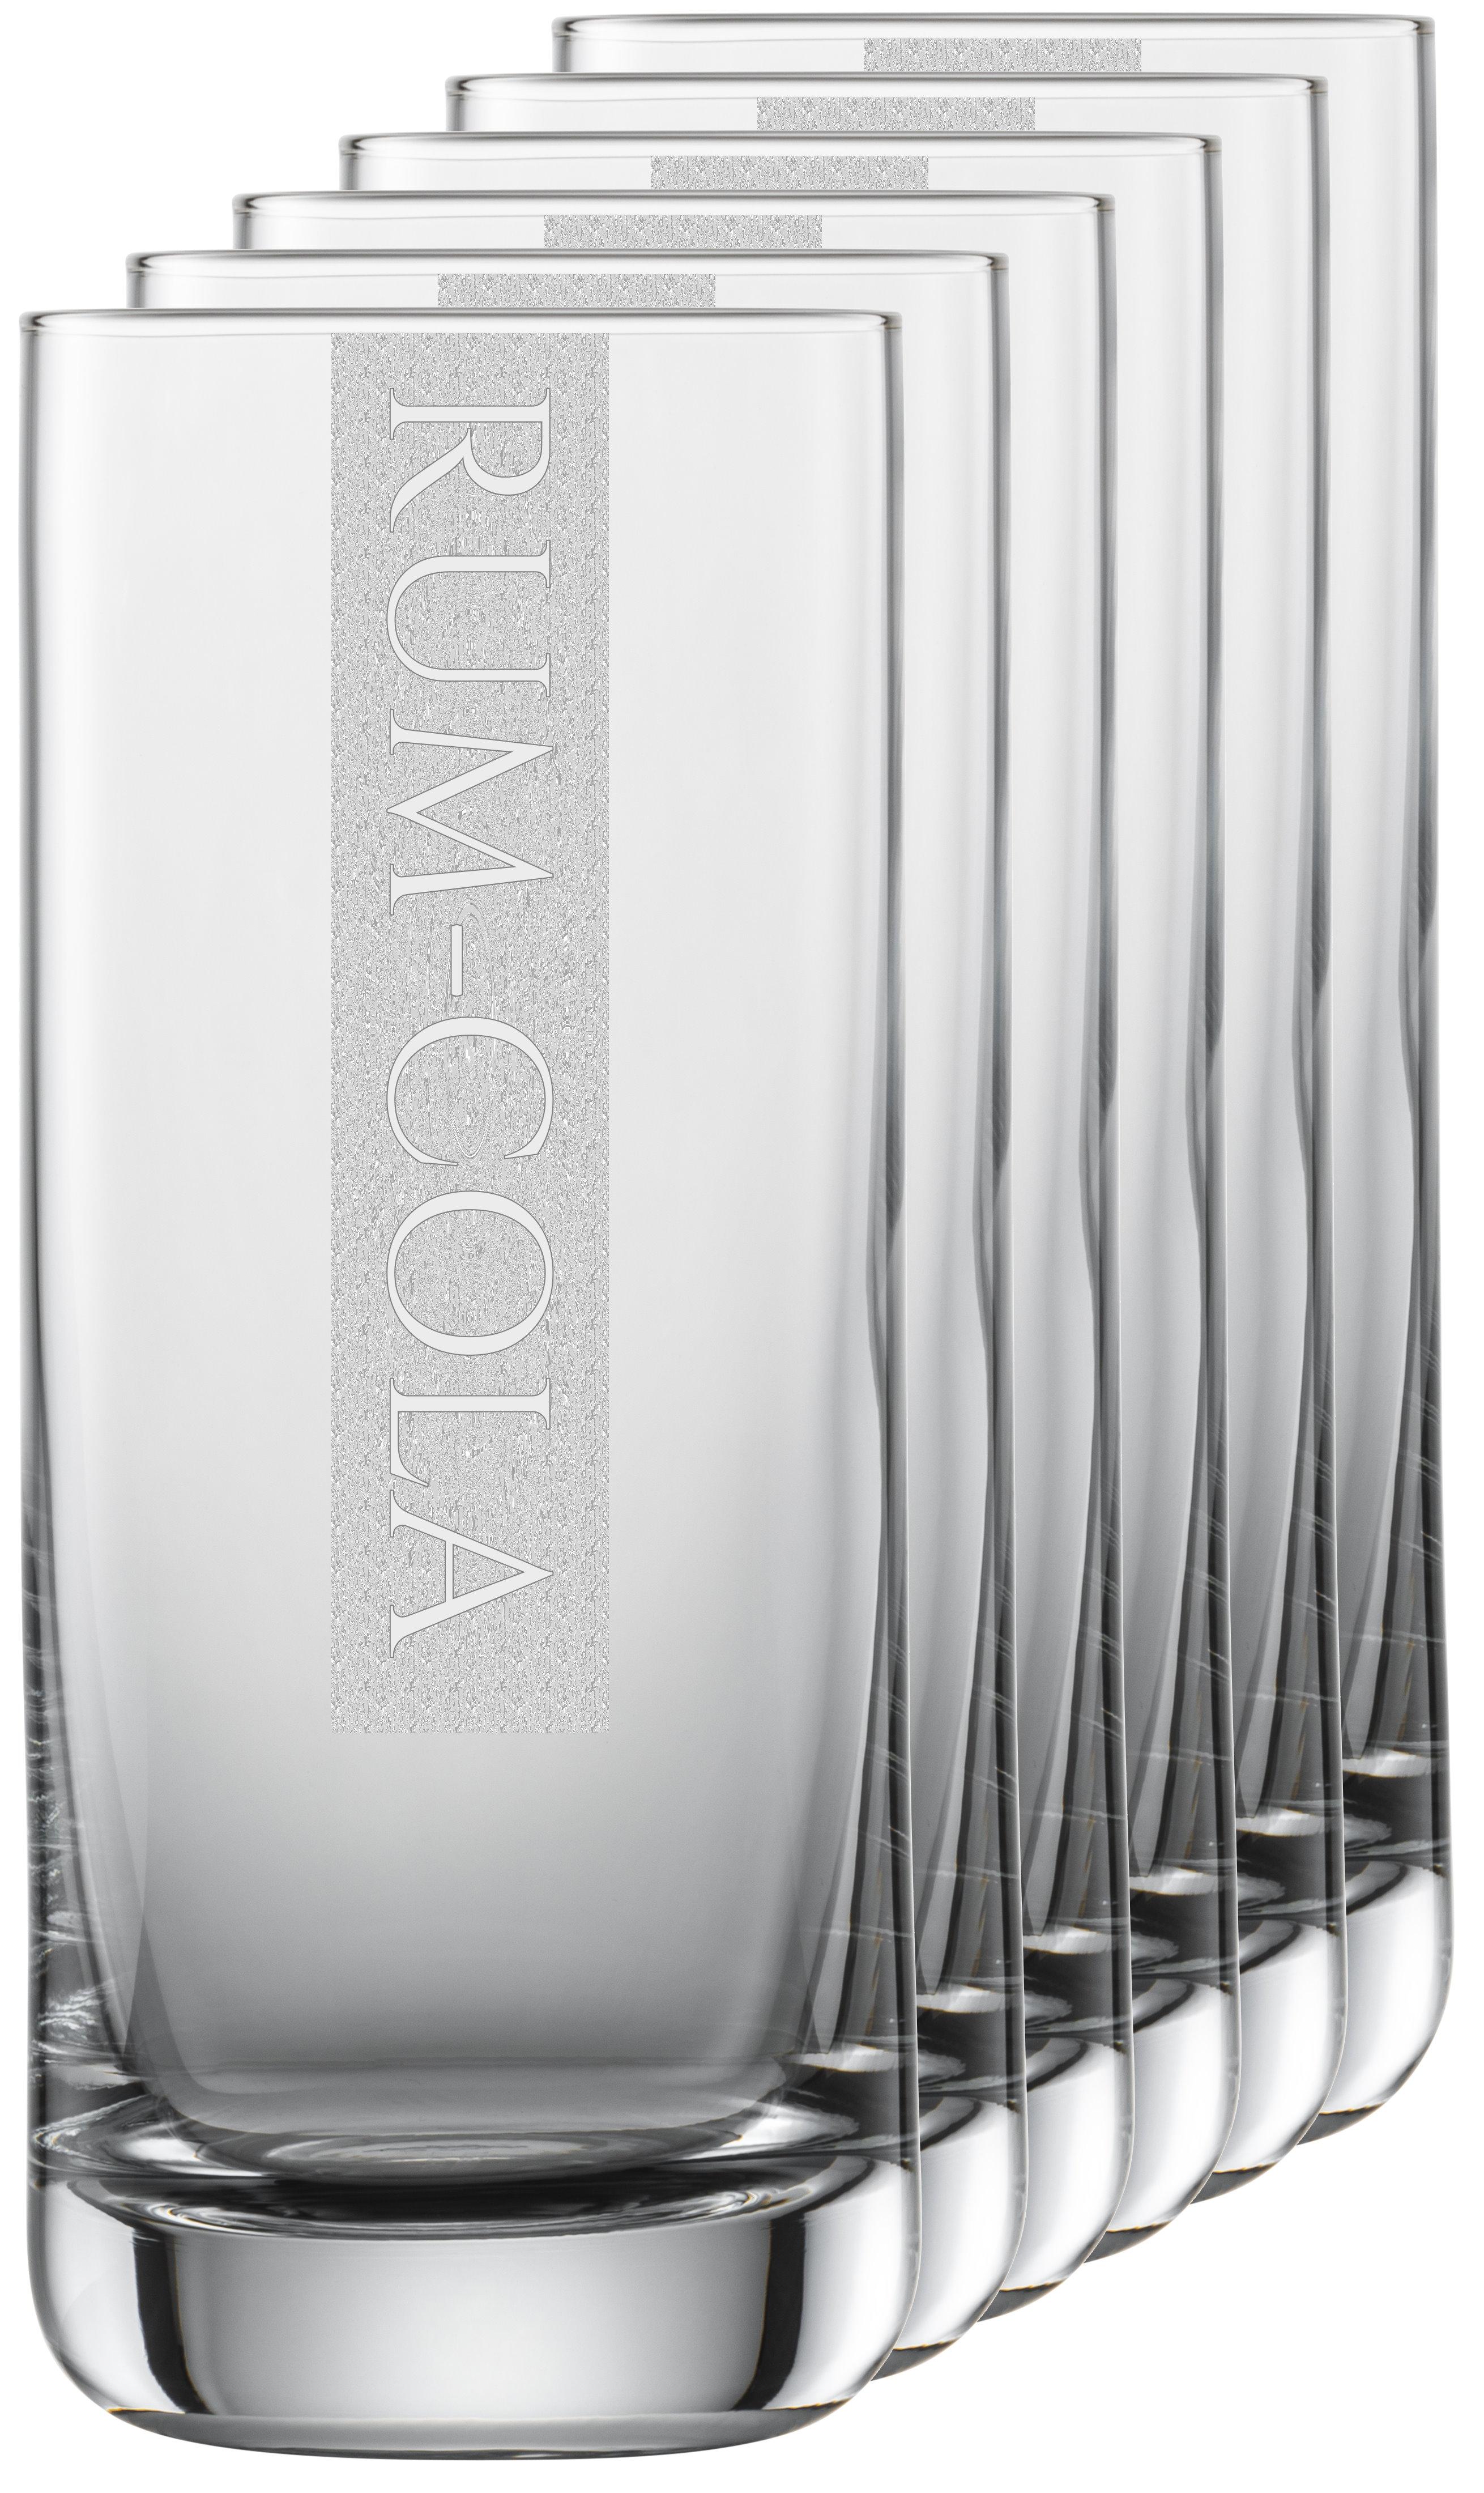 RUM-COLA Gläser | 6 Stück 390ml Schott Longdrinkglas | CoolGlas